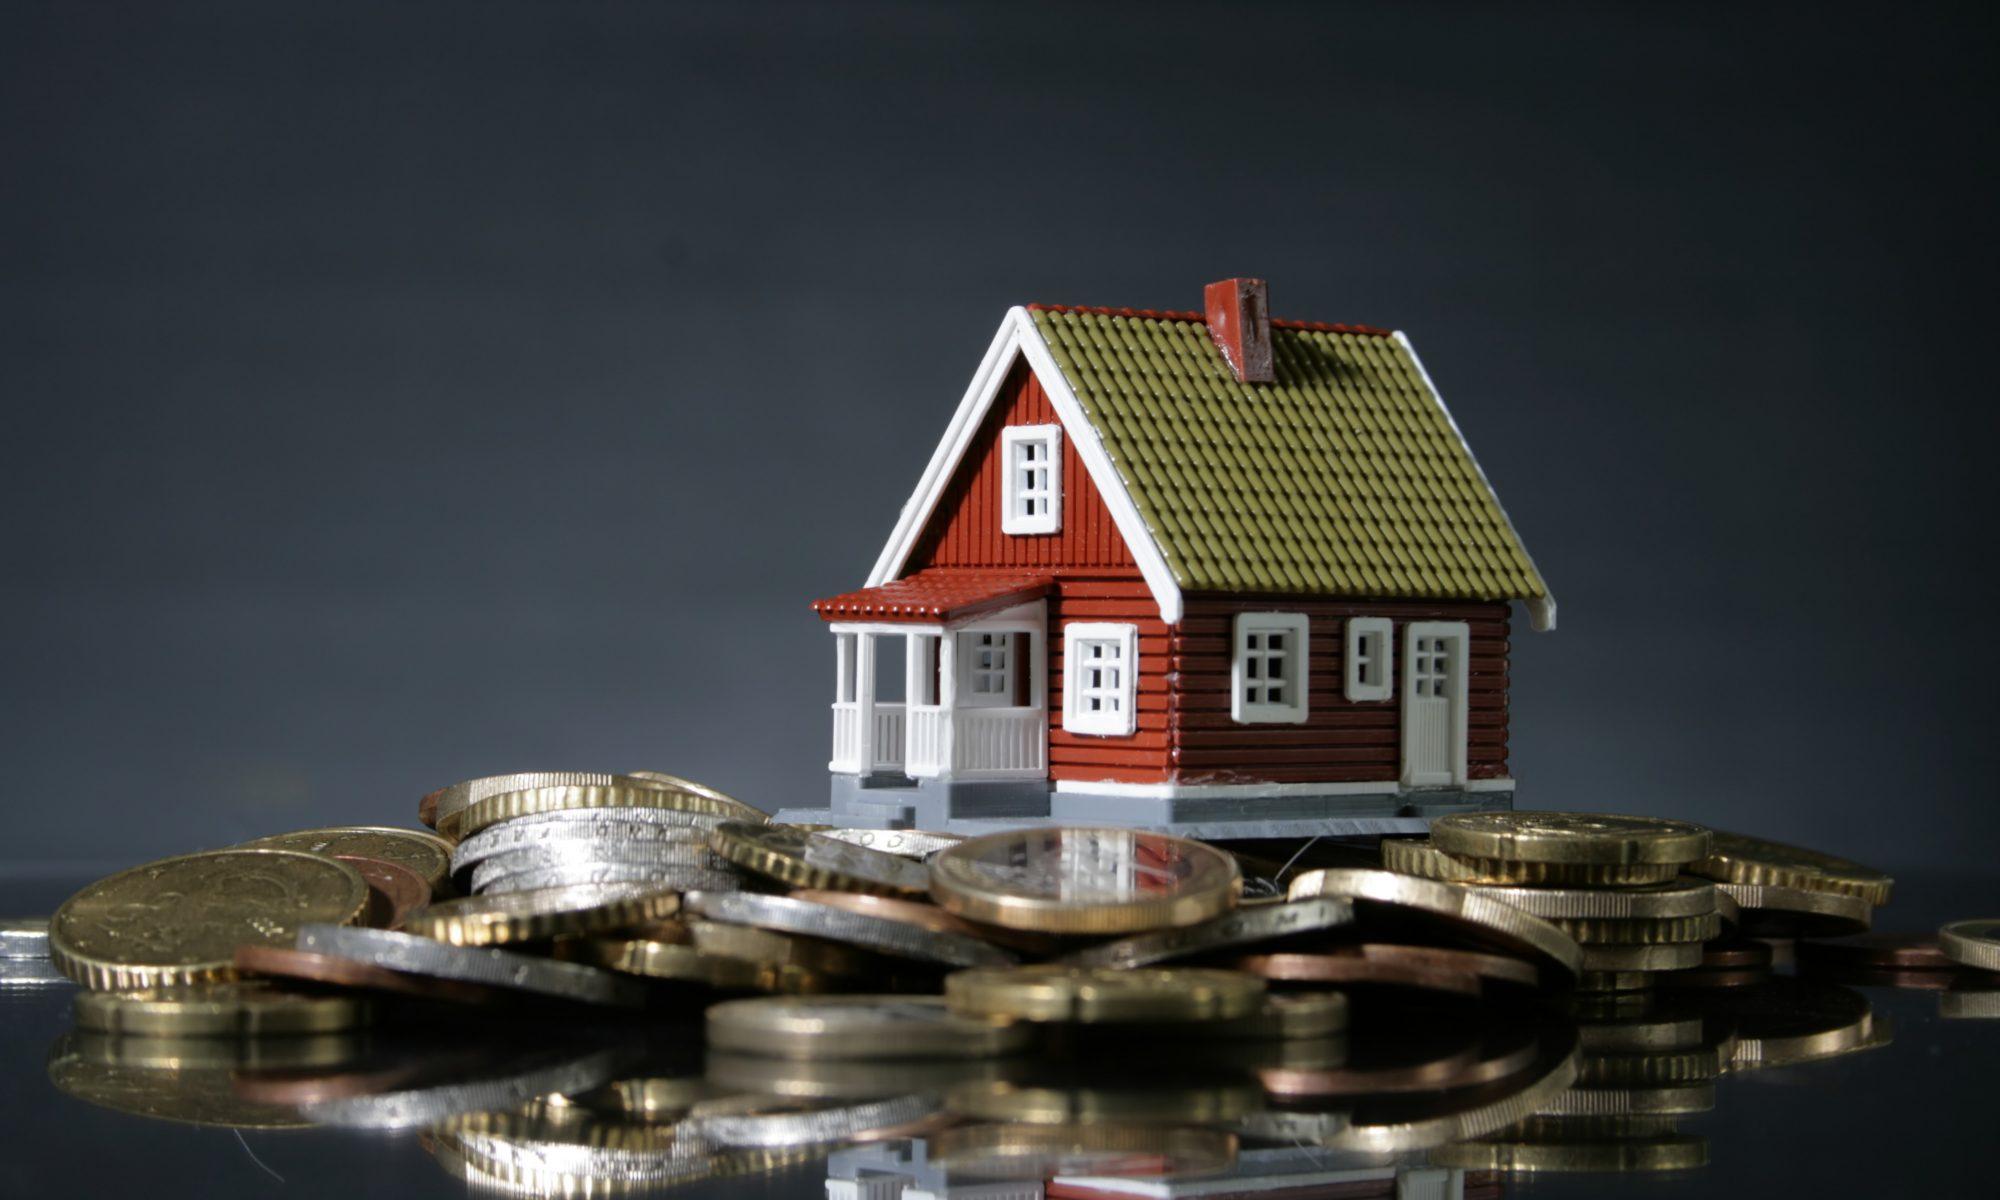 тинькофф кредит под залог недвижимости условия более займ на 30 дней мгновенно